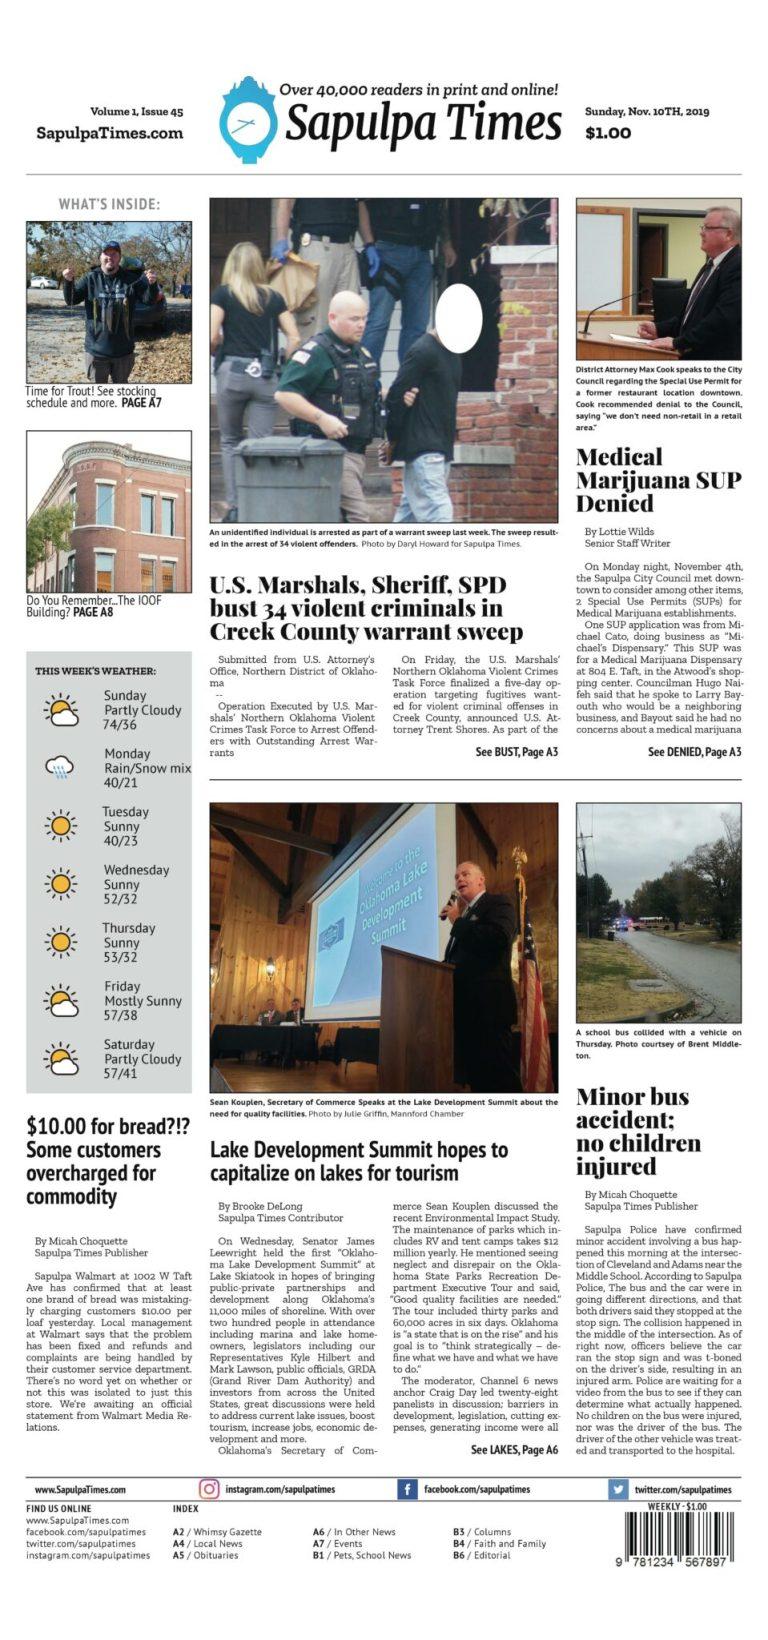 Sapulpa Times Digital Edition 11/10/2019